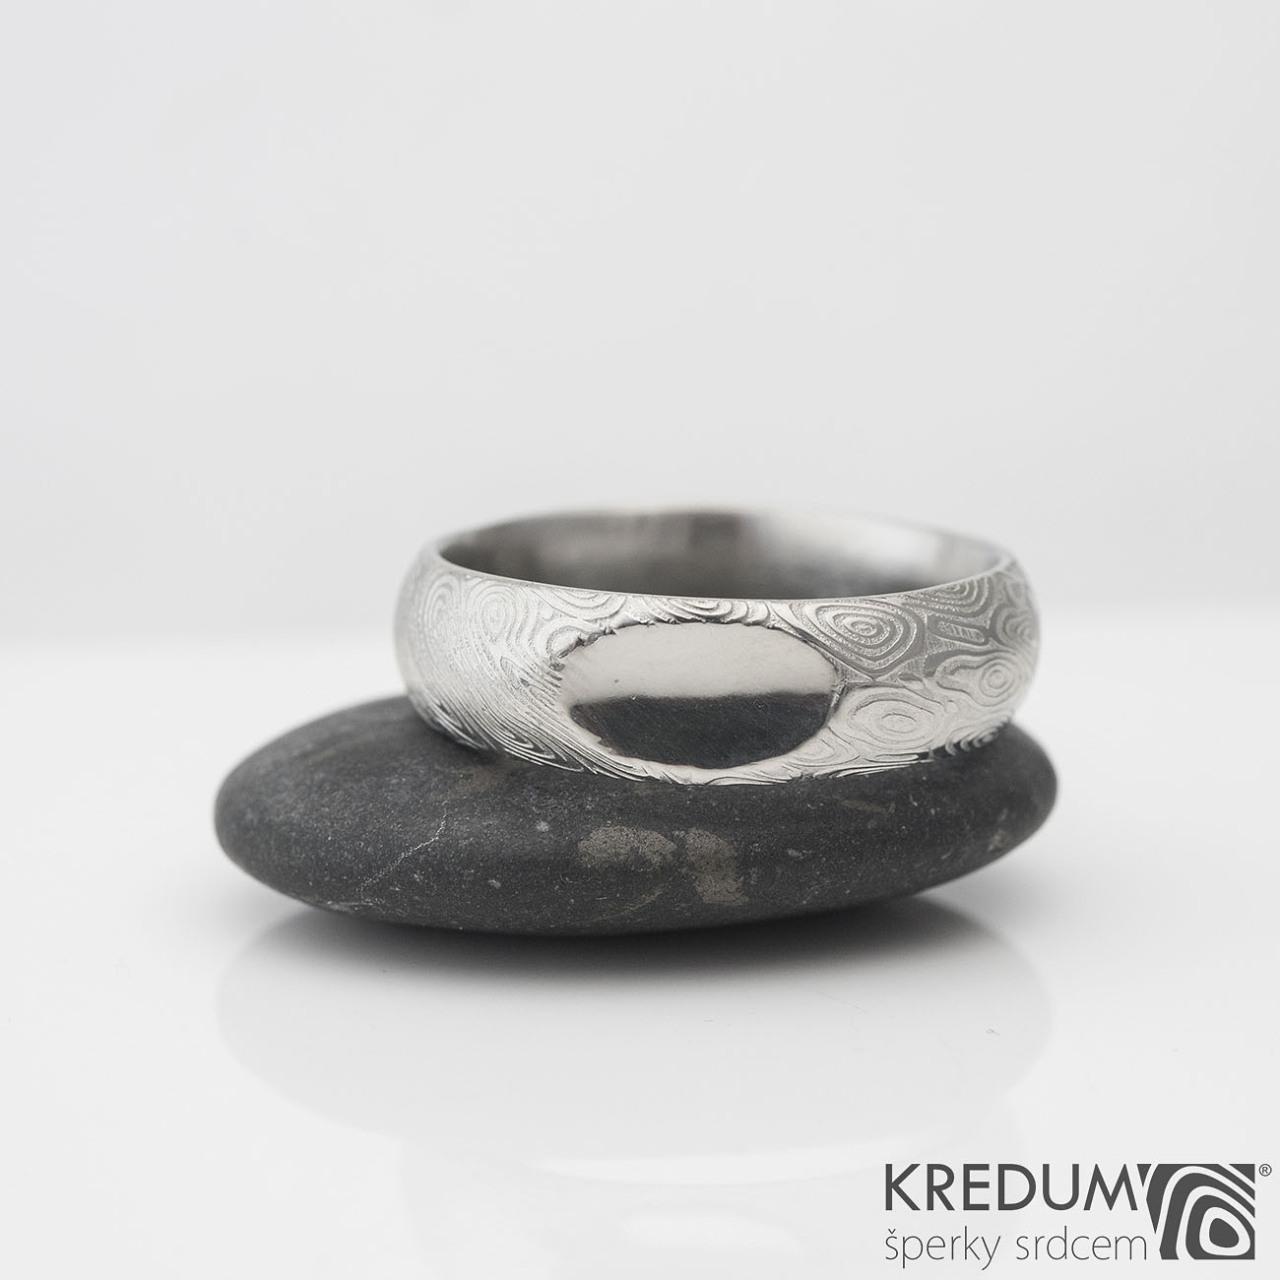 Prima A Ozdoba Struktura Atypicka Kolecka Kovany Snubni Prsten Z